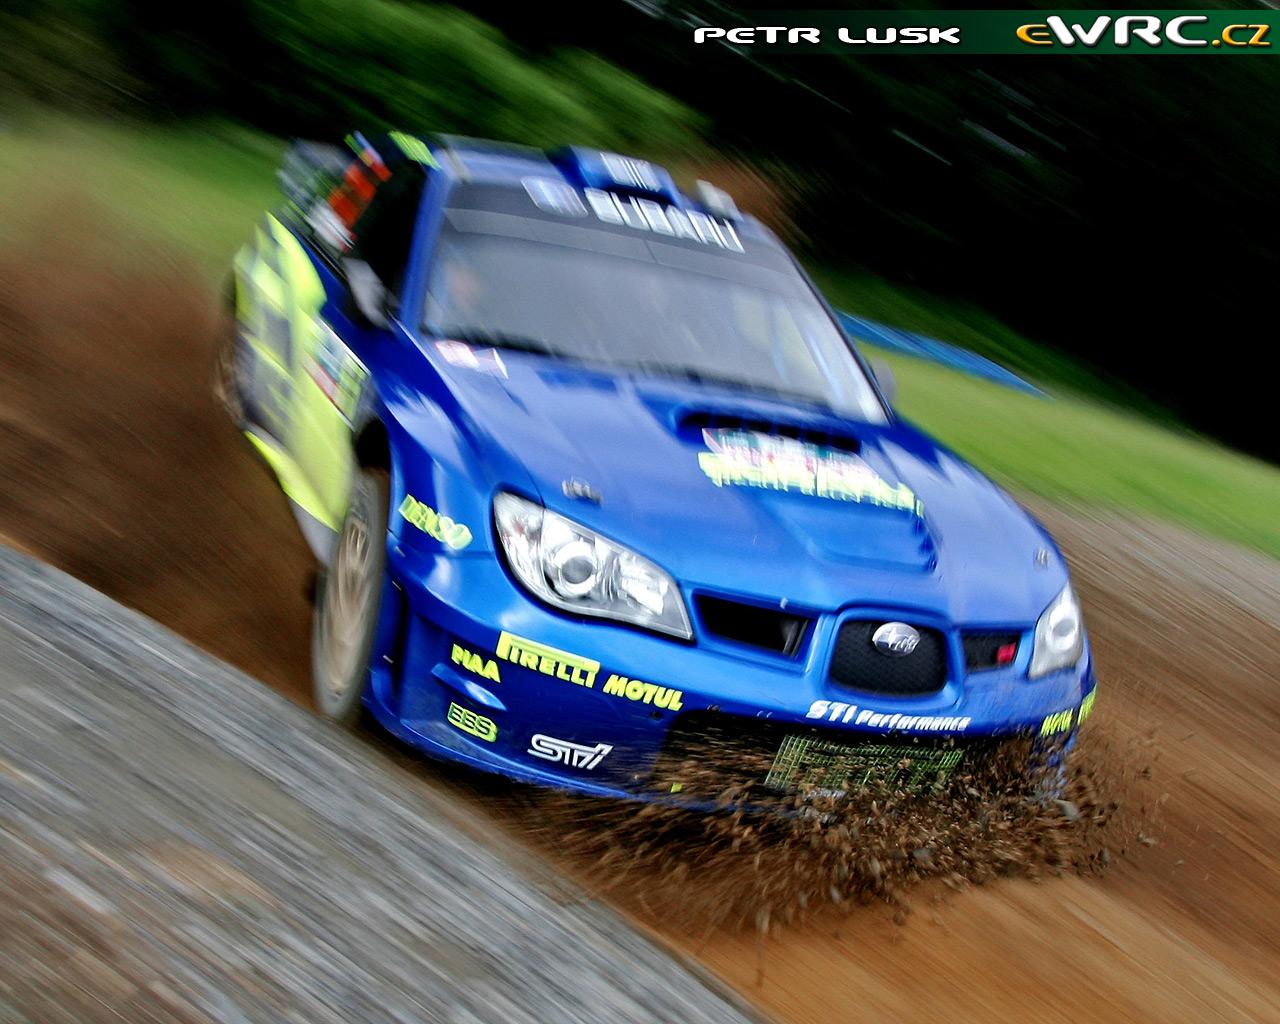 rally car Wallpaper, скачать фото, ралли машина, авто, скачать фото